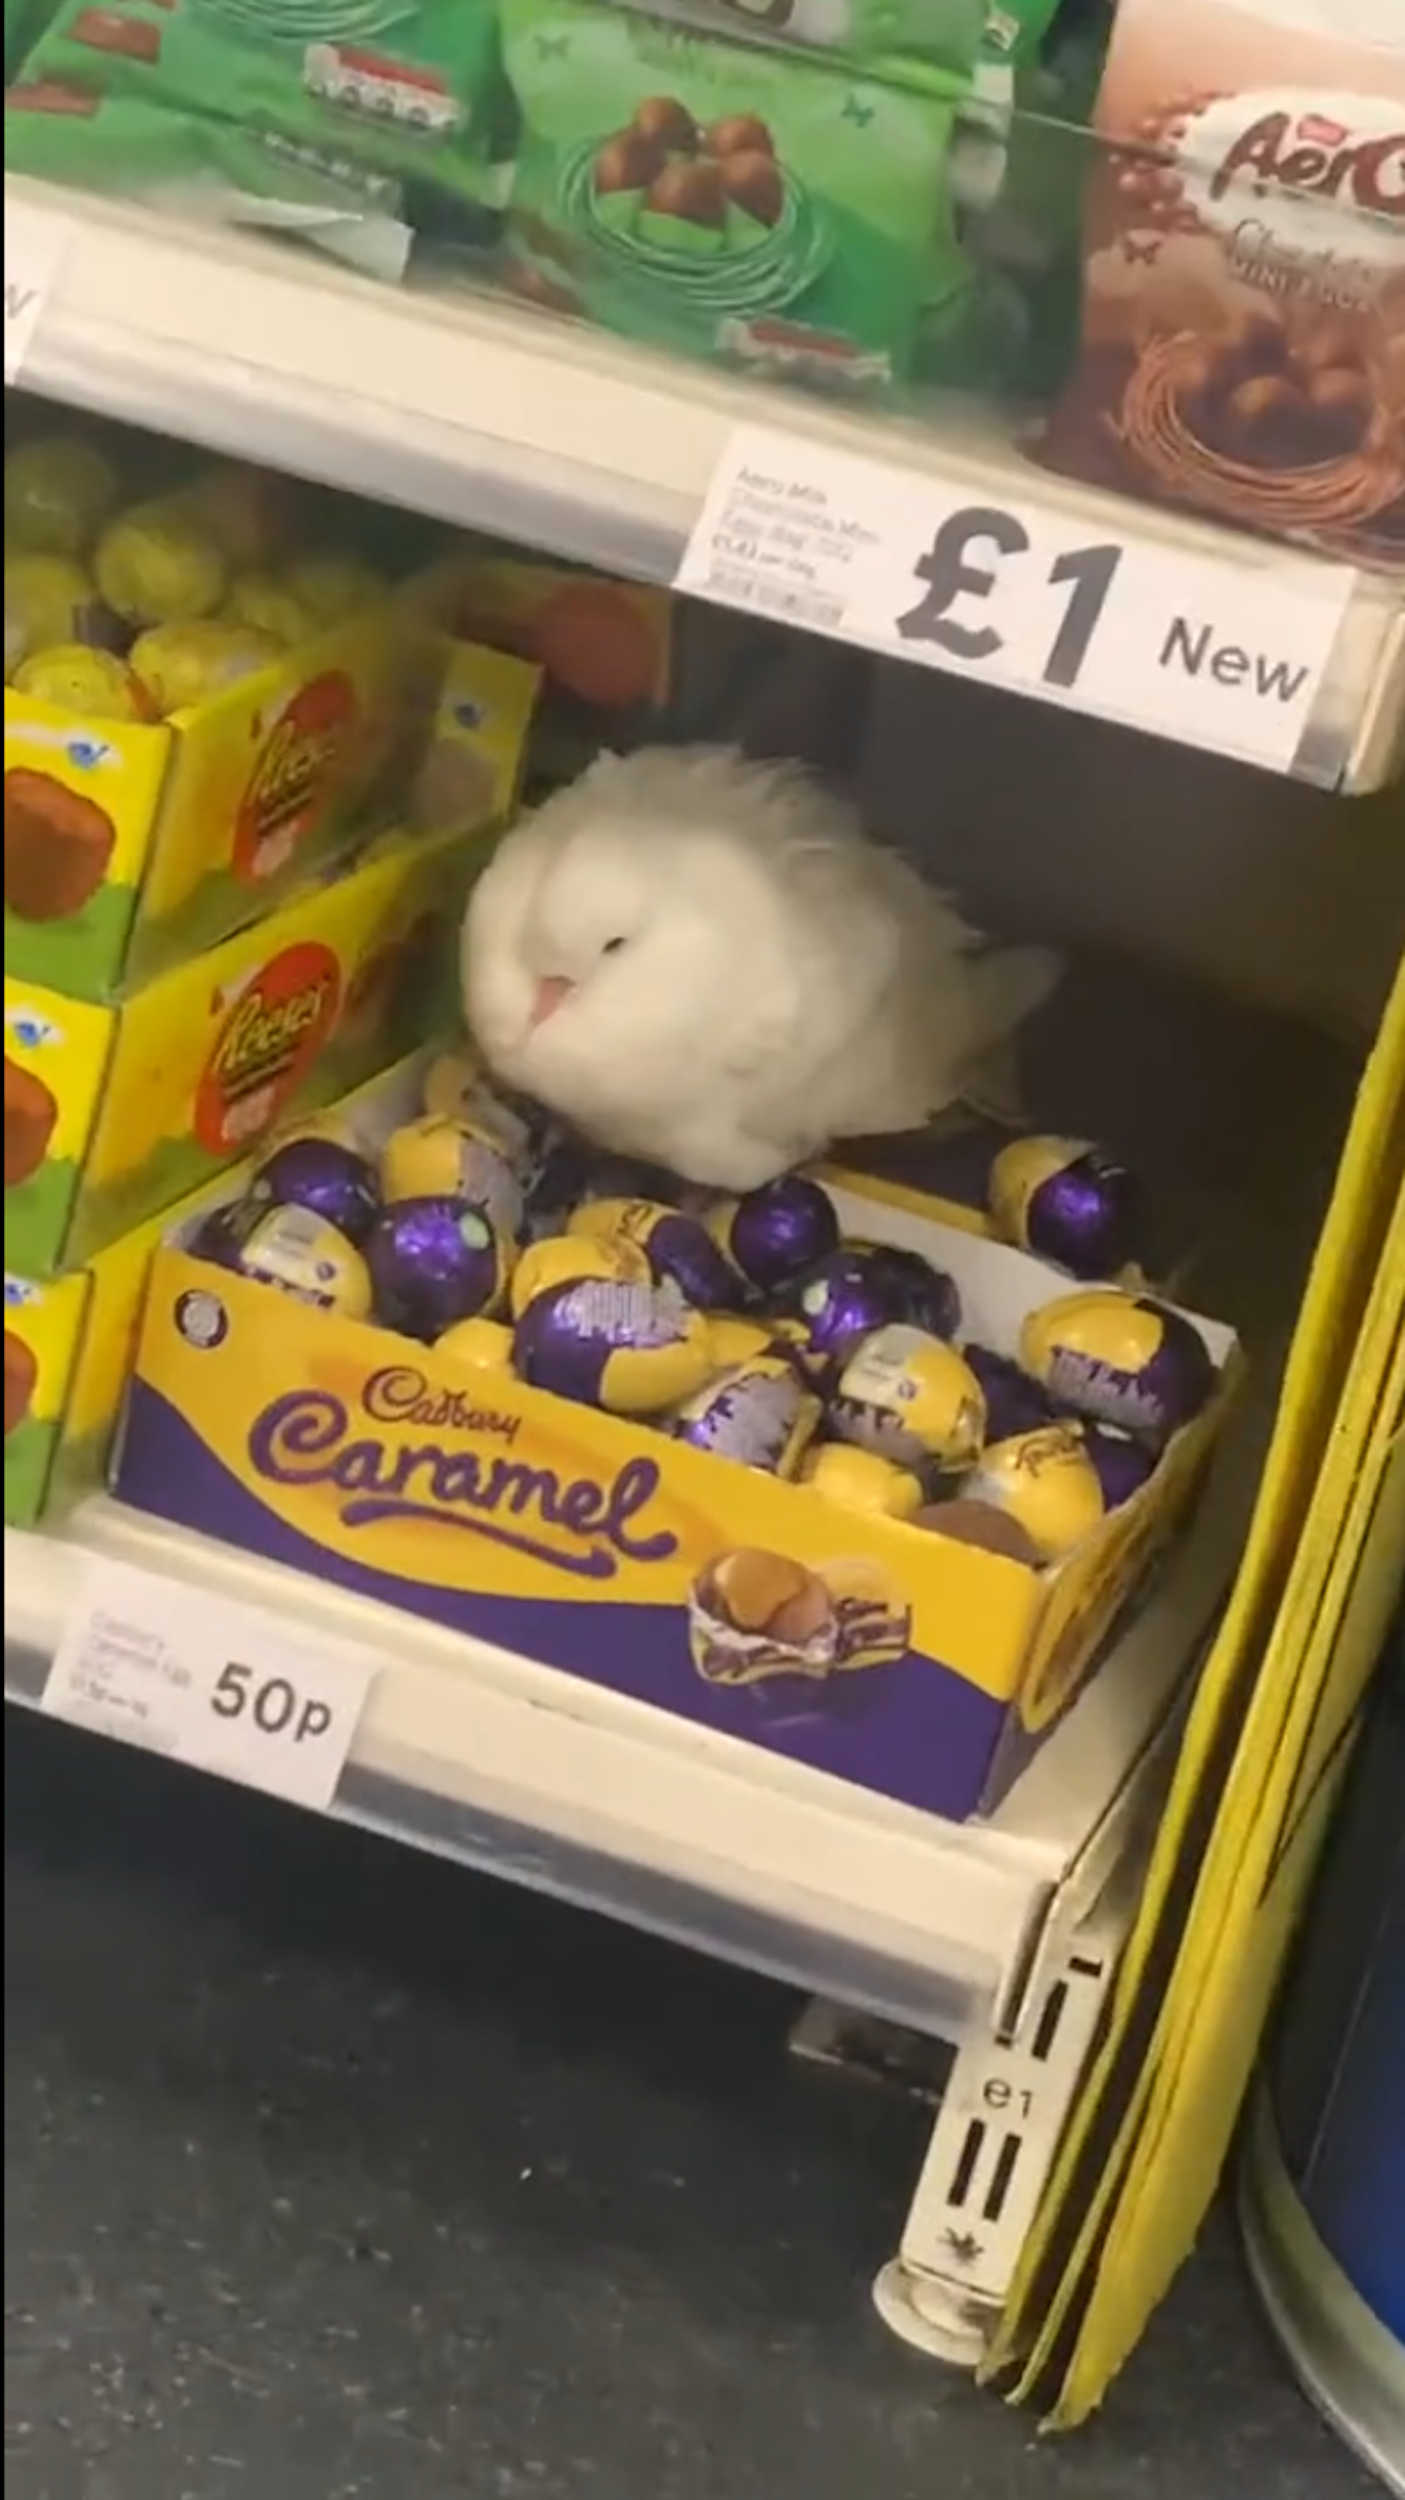 pigeon nesting in Tesco - Viral Video News